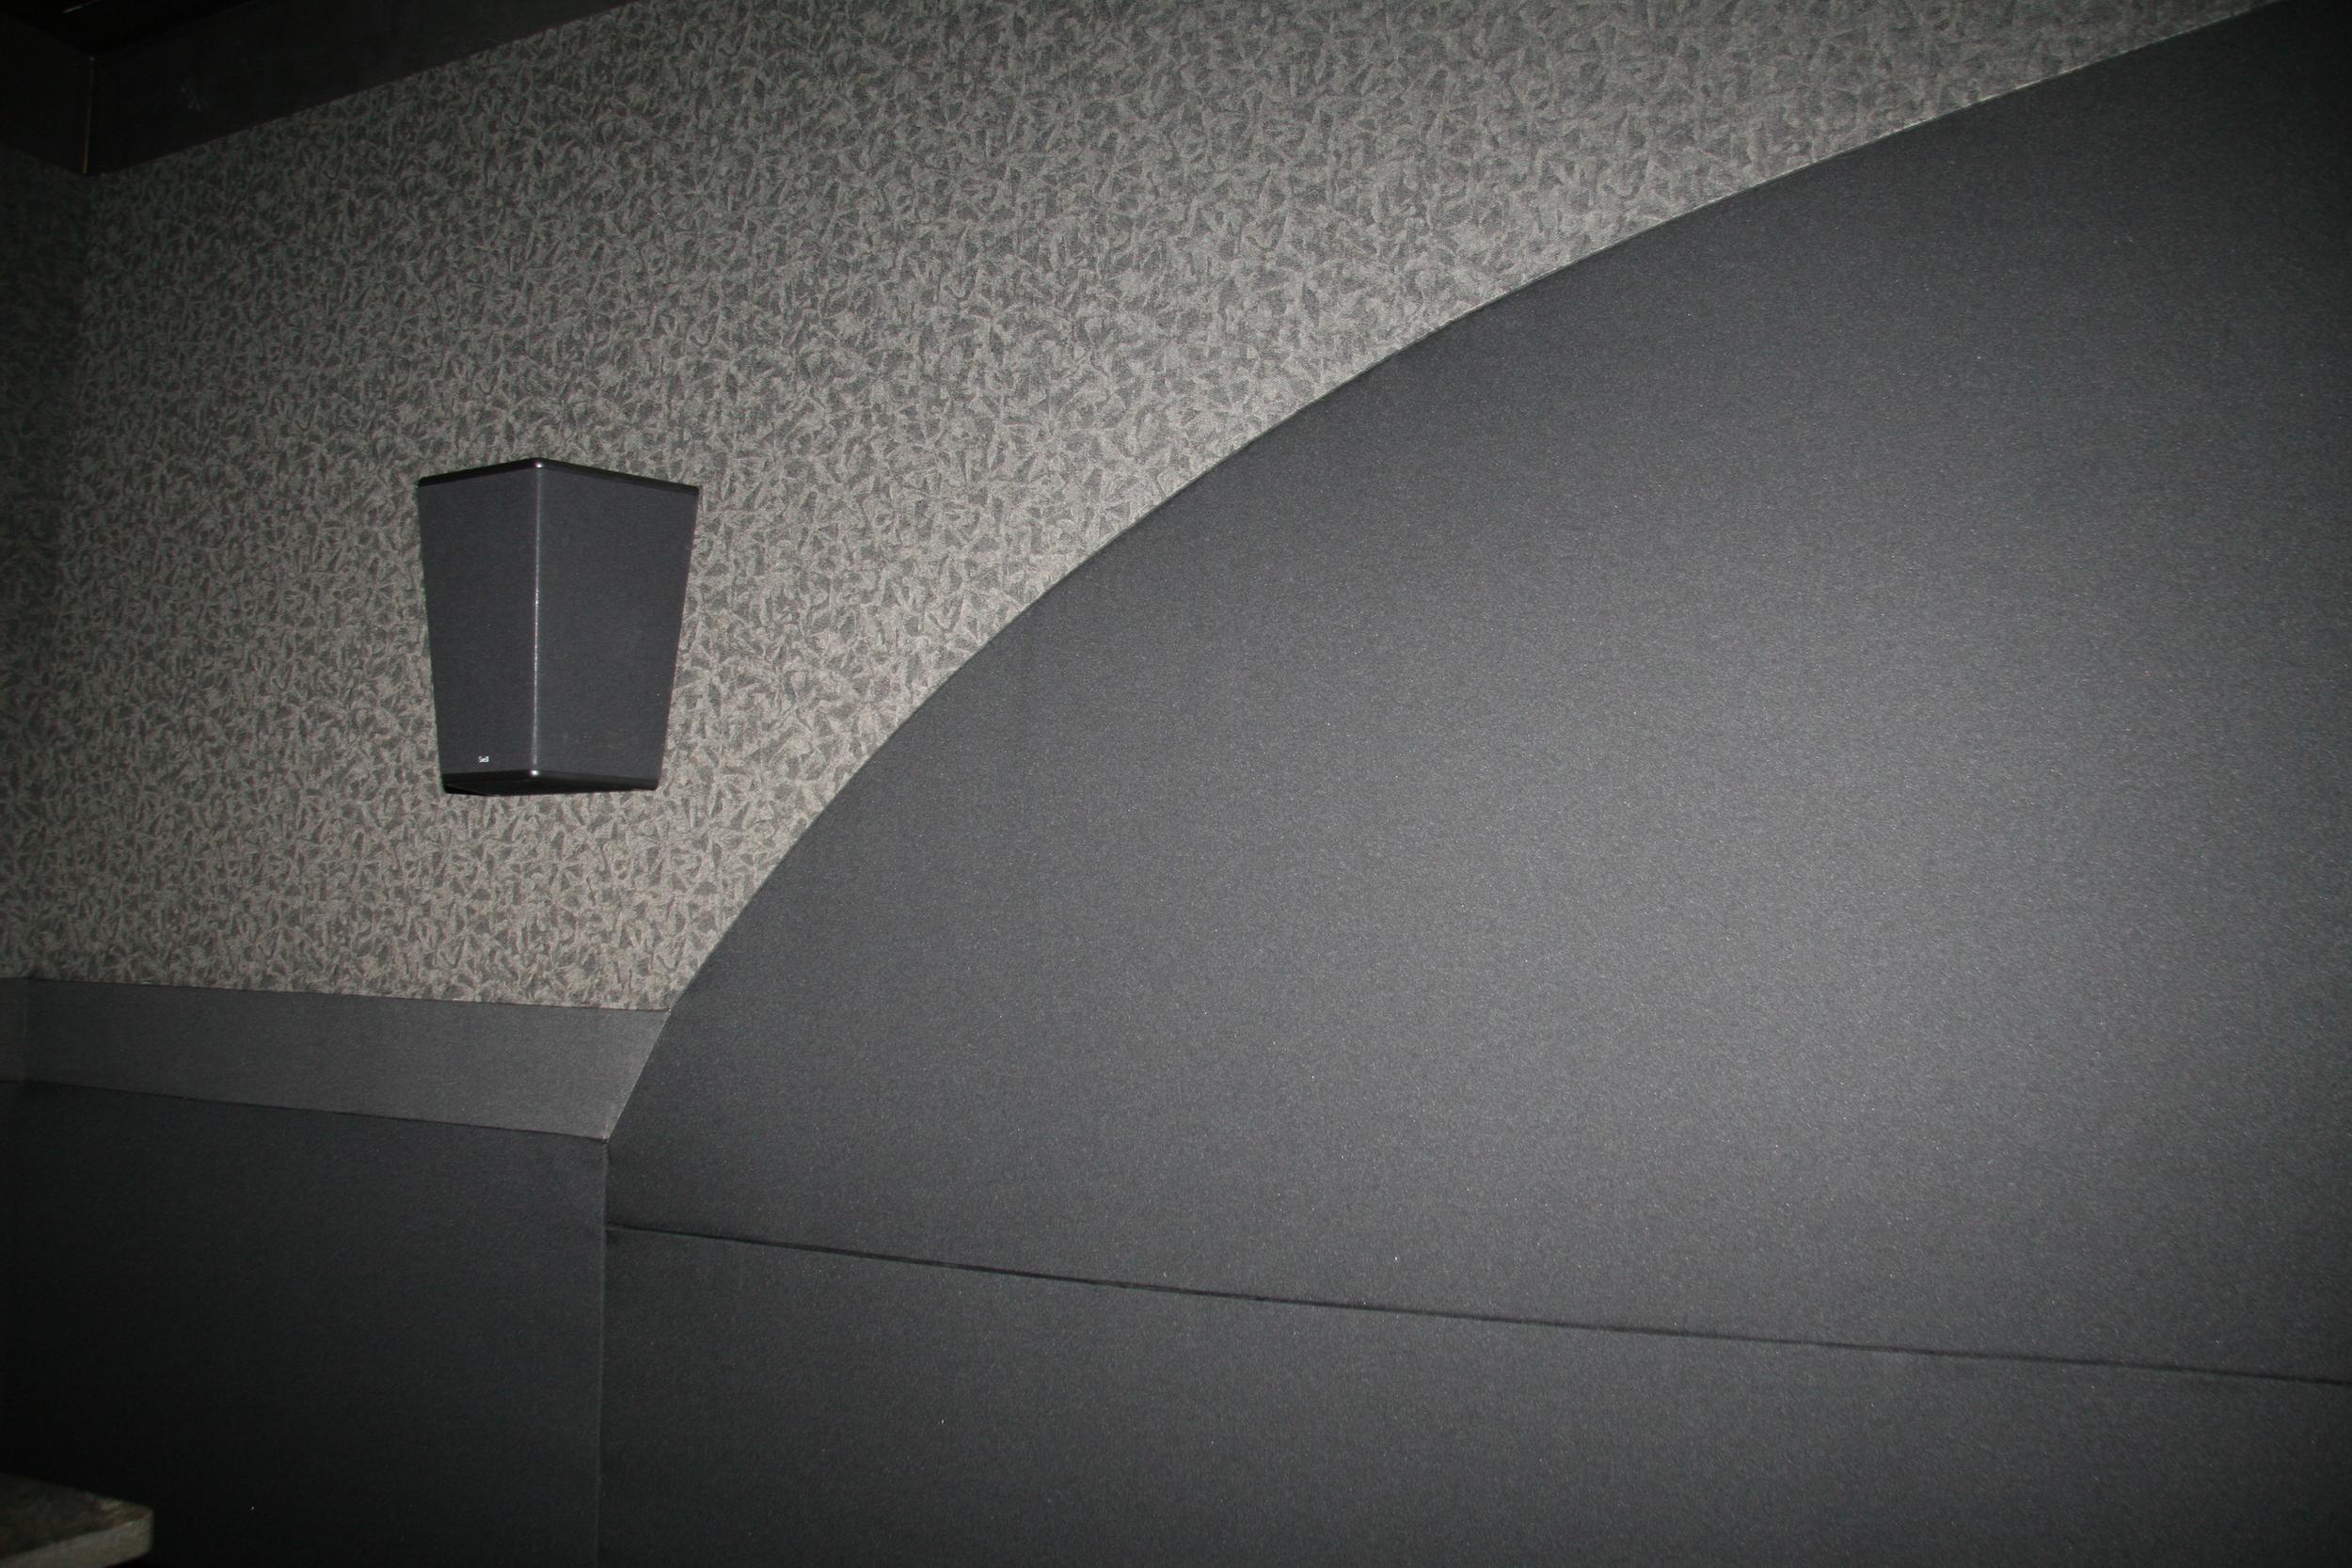 Cinqo De Mayo 2010 240.JPG